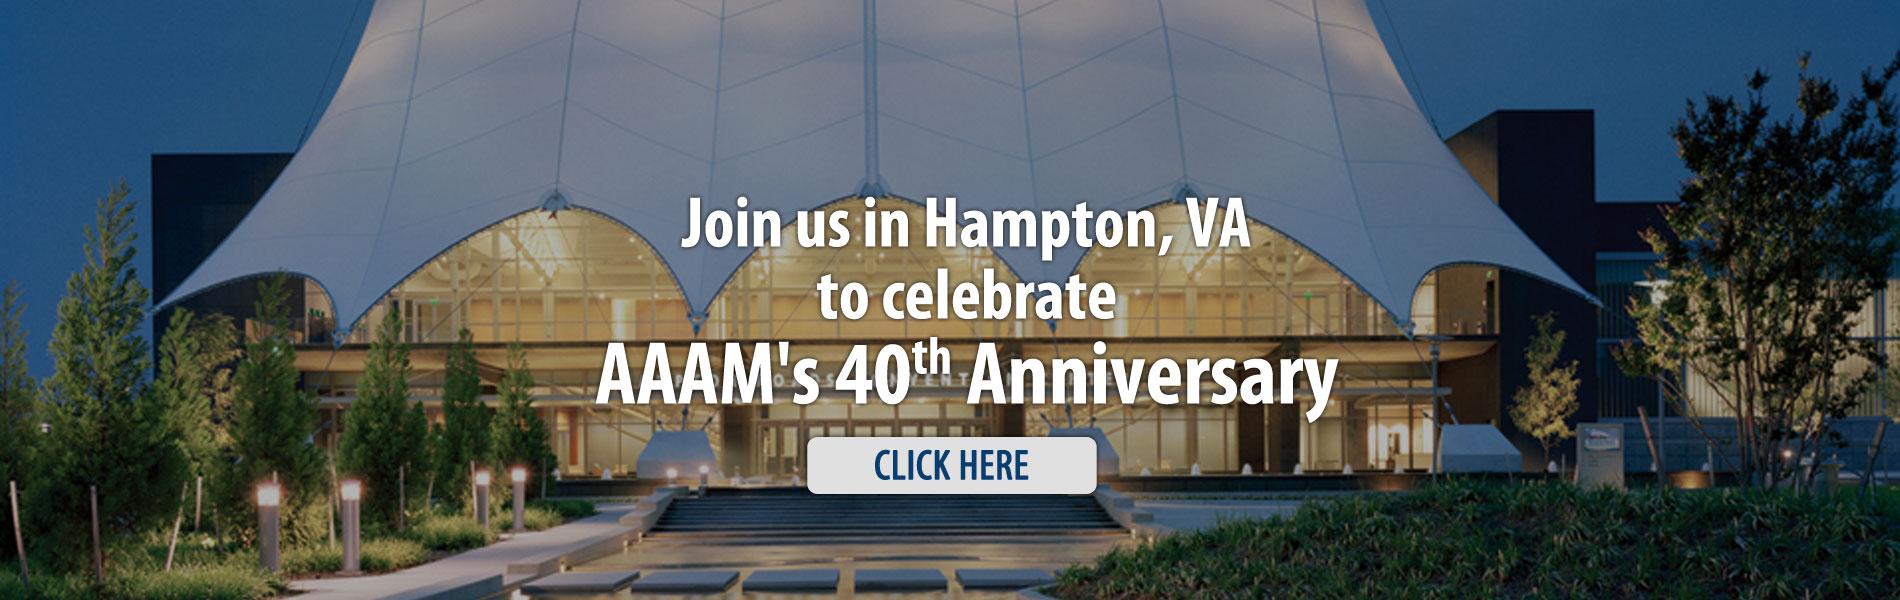 Hampton Roads Convention Center